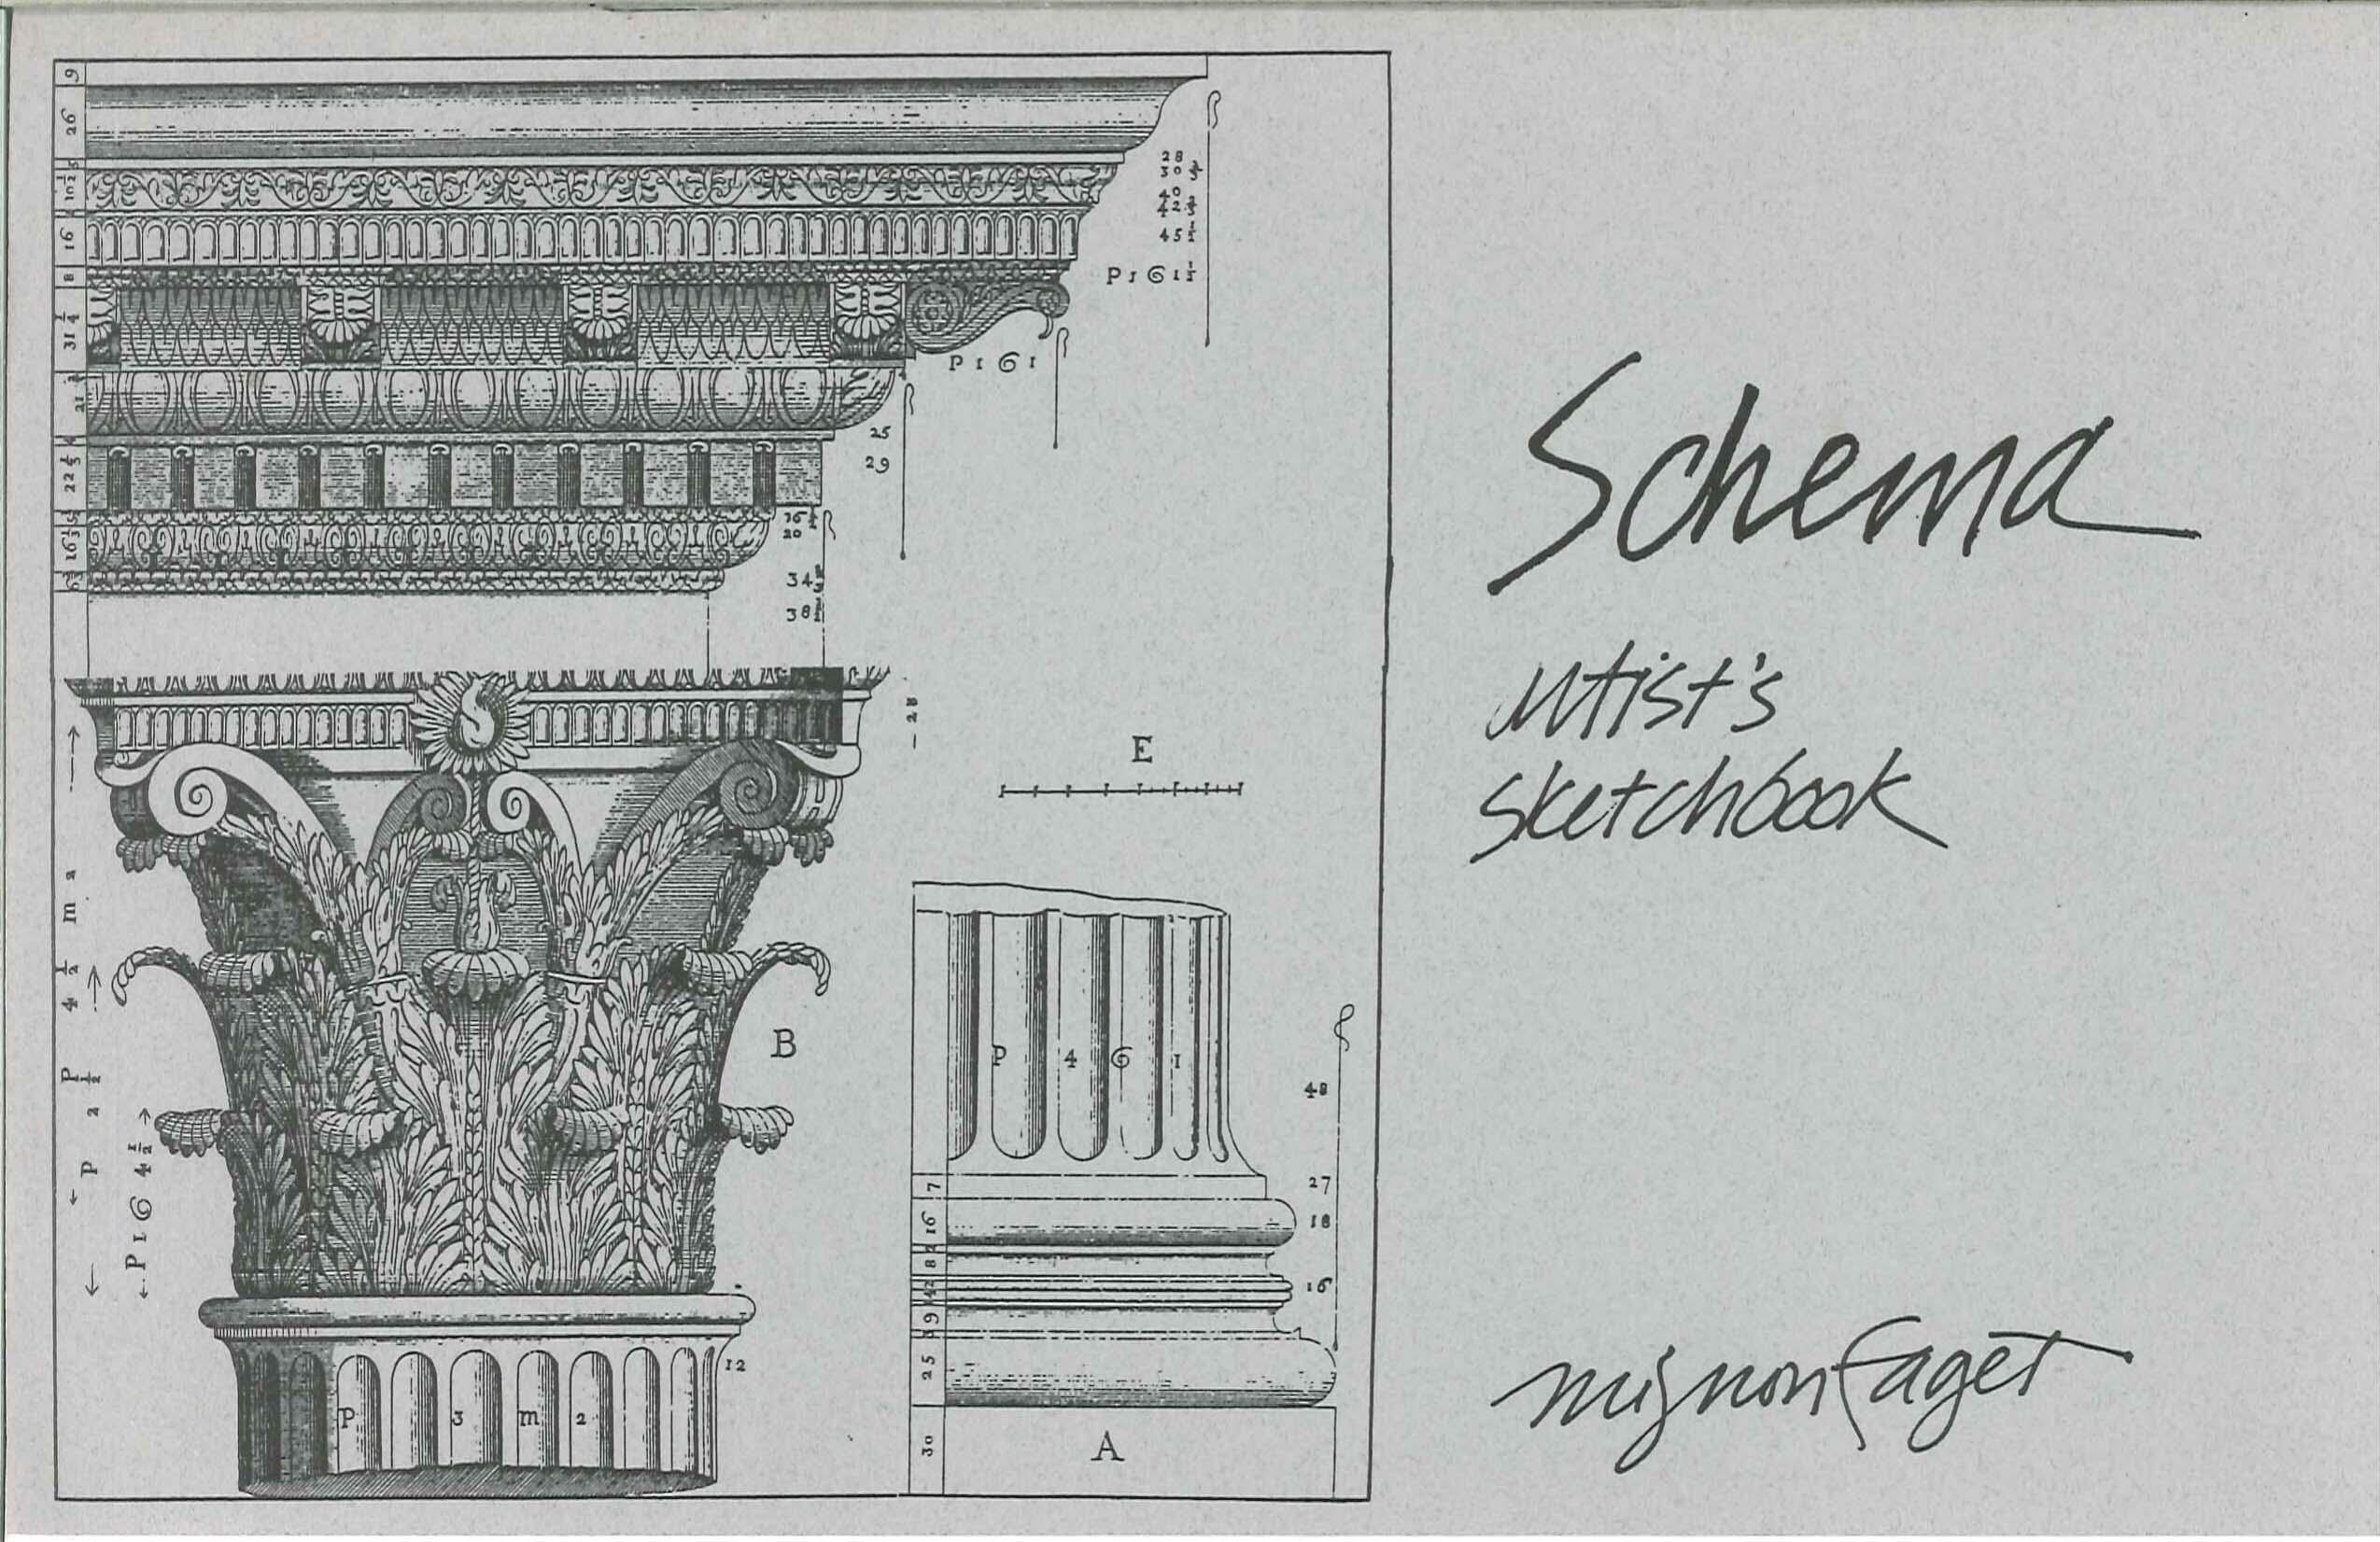 Schema Artist's Sketchbook Cover